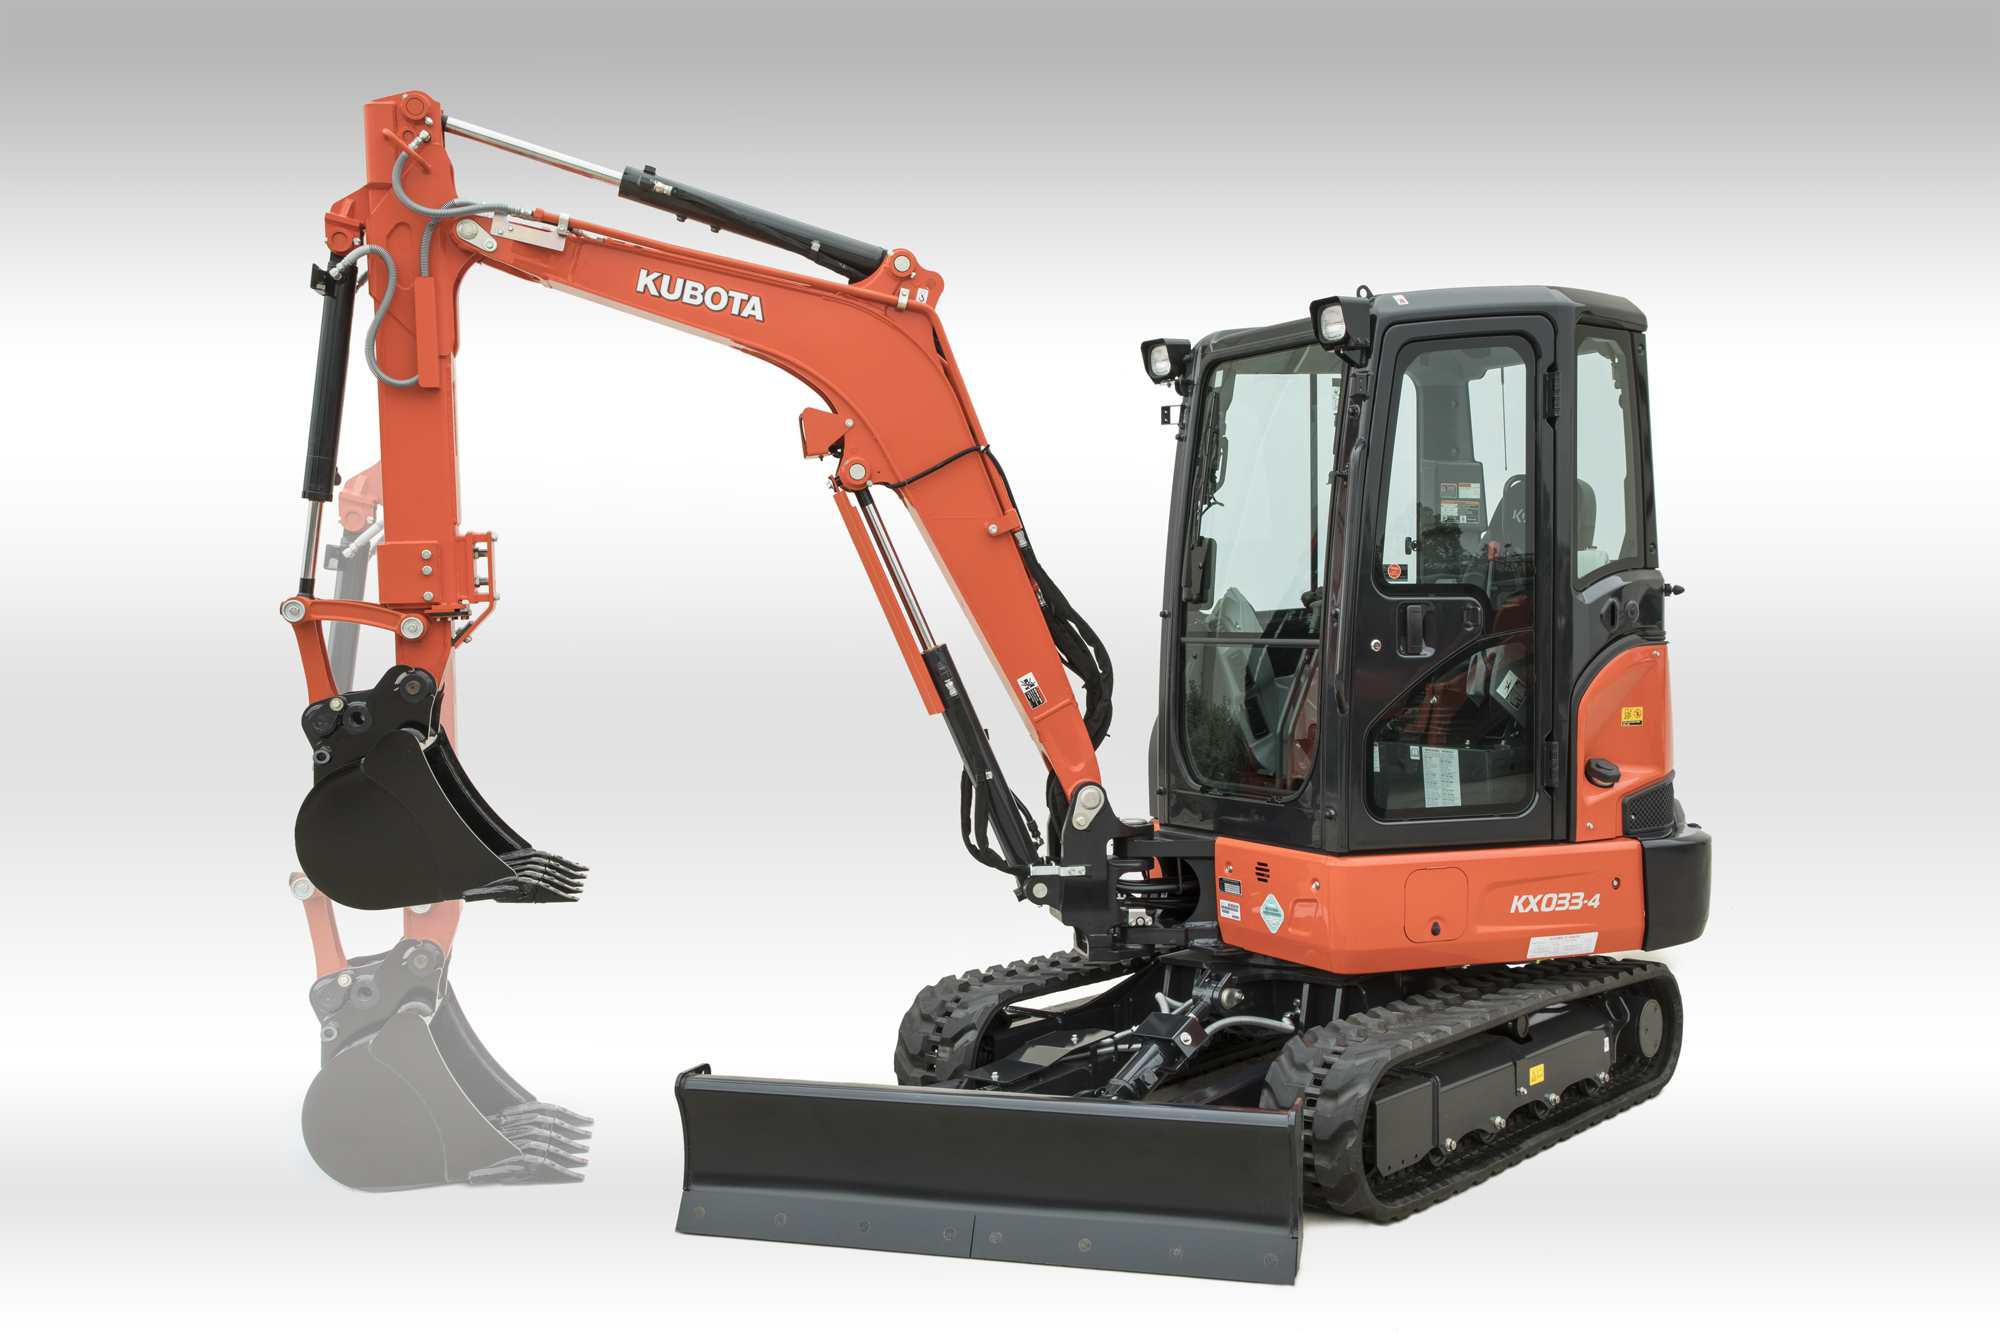 Kubota intros 2 new compact excavators: the U27-4 and the